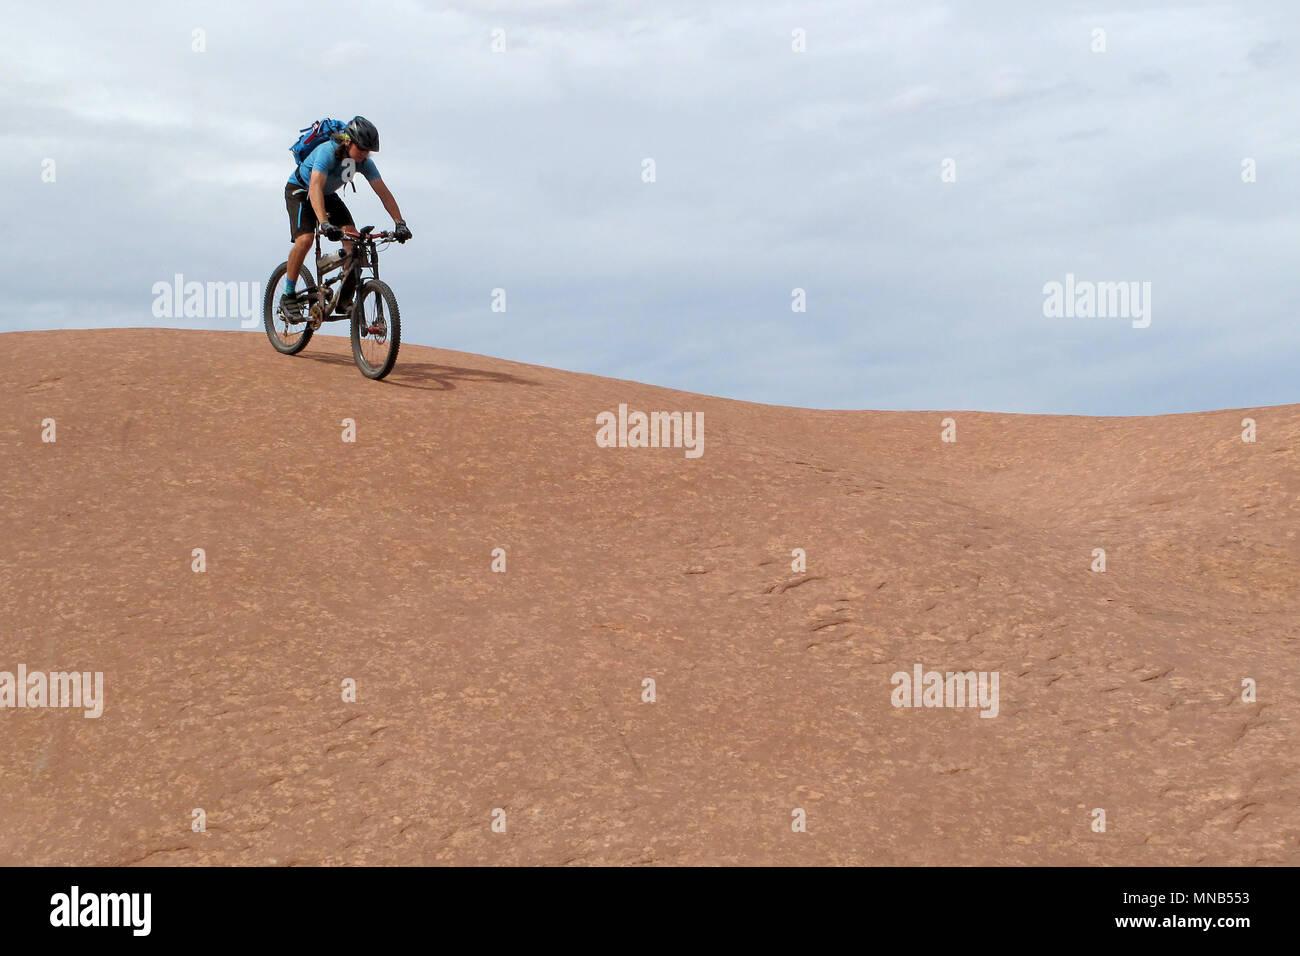 Mountain biker riding downhill the famous Slickrock trail, Moab, USA - Stock Image